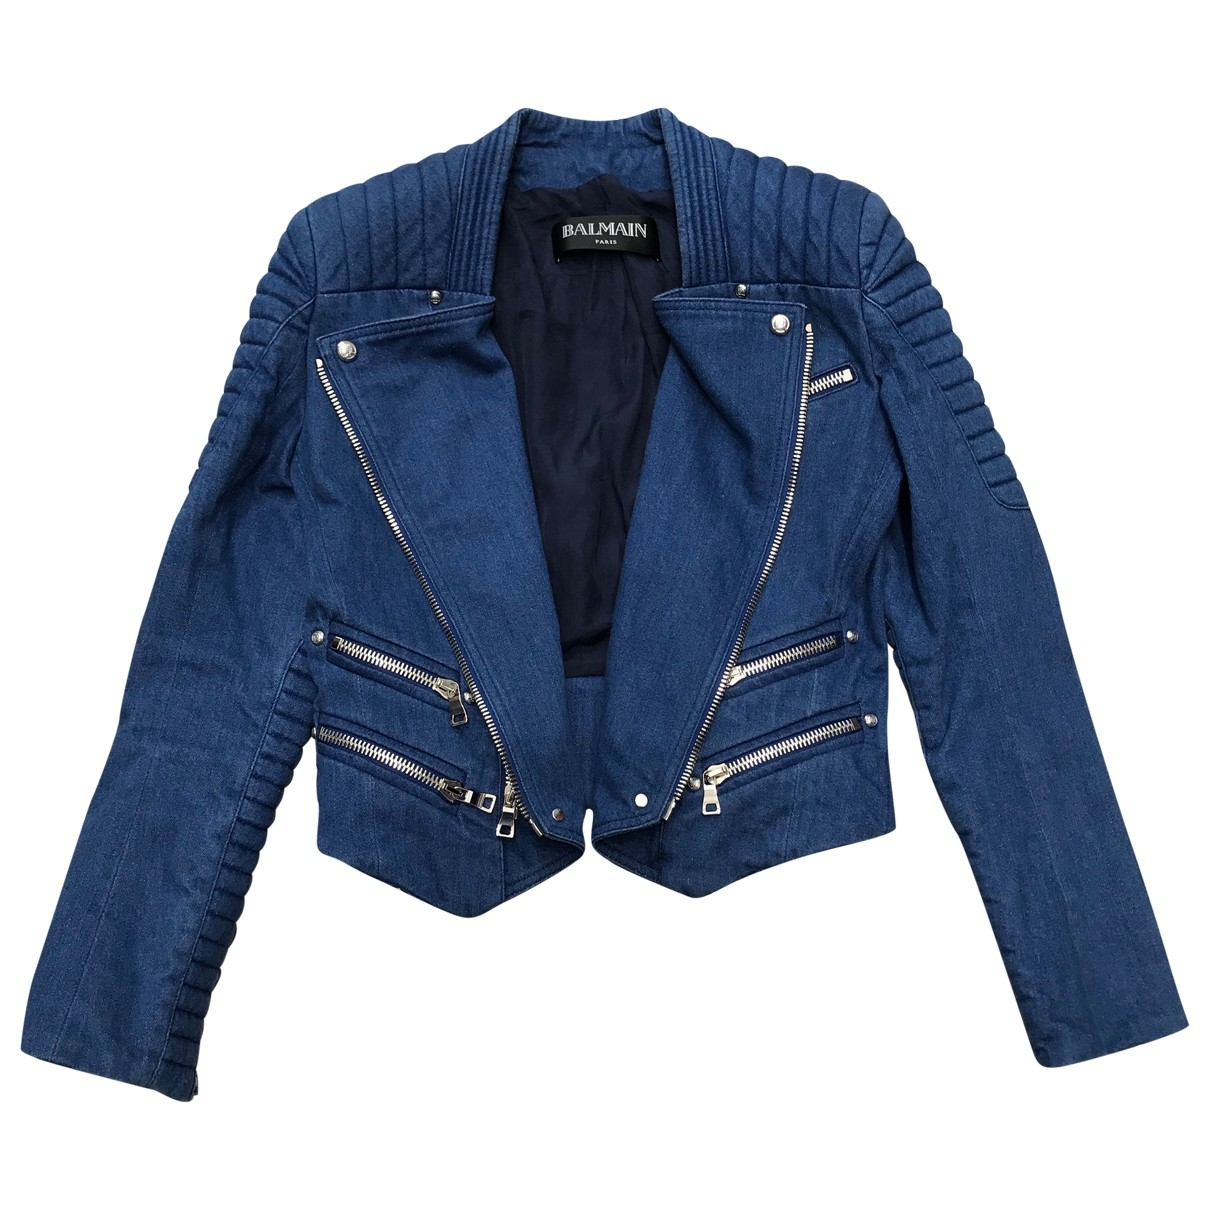 Balmain \N Blue Cotton jacket for Women 38 IT